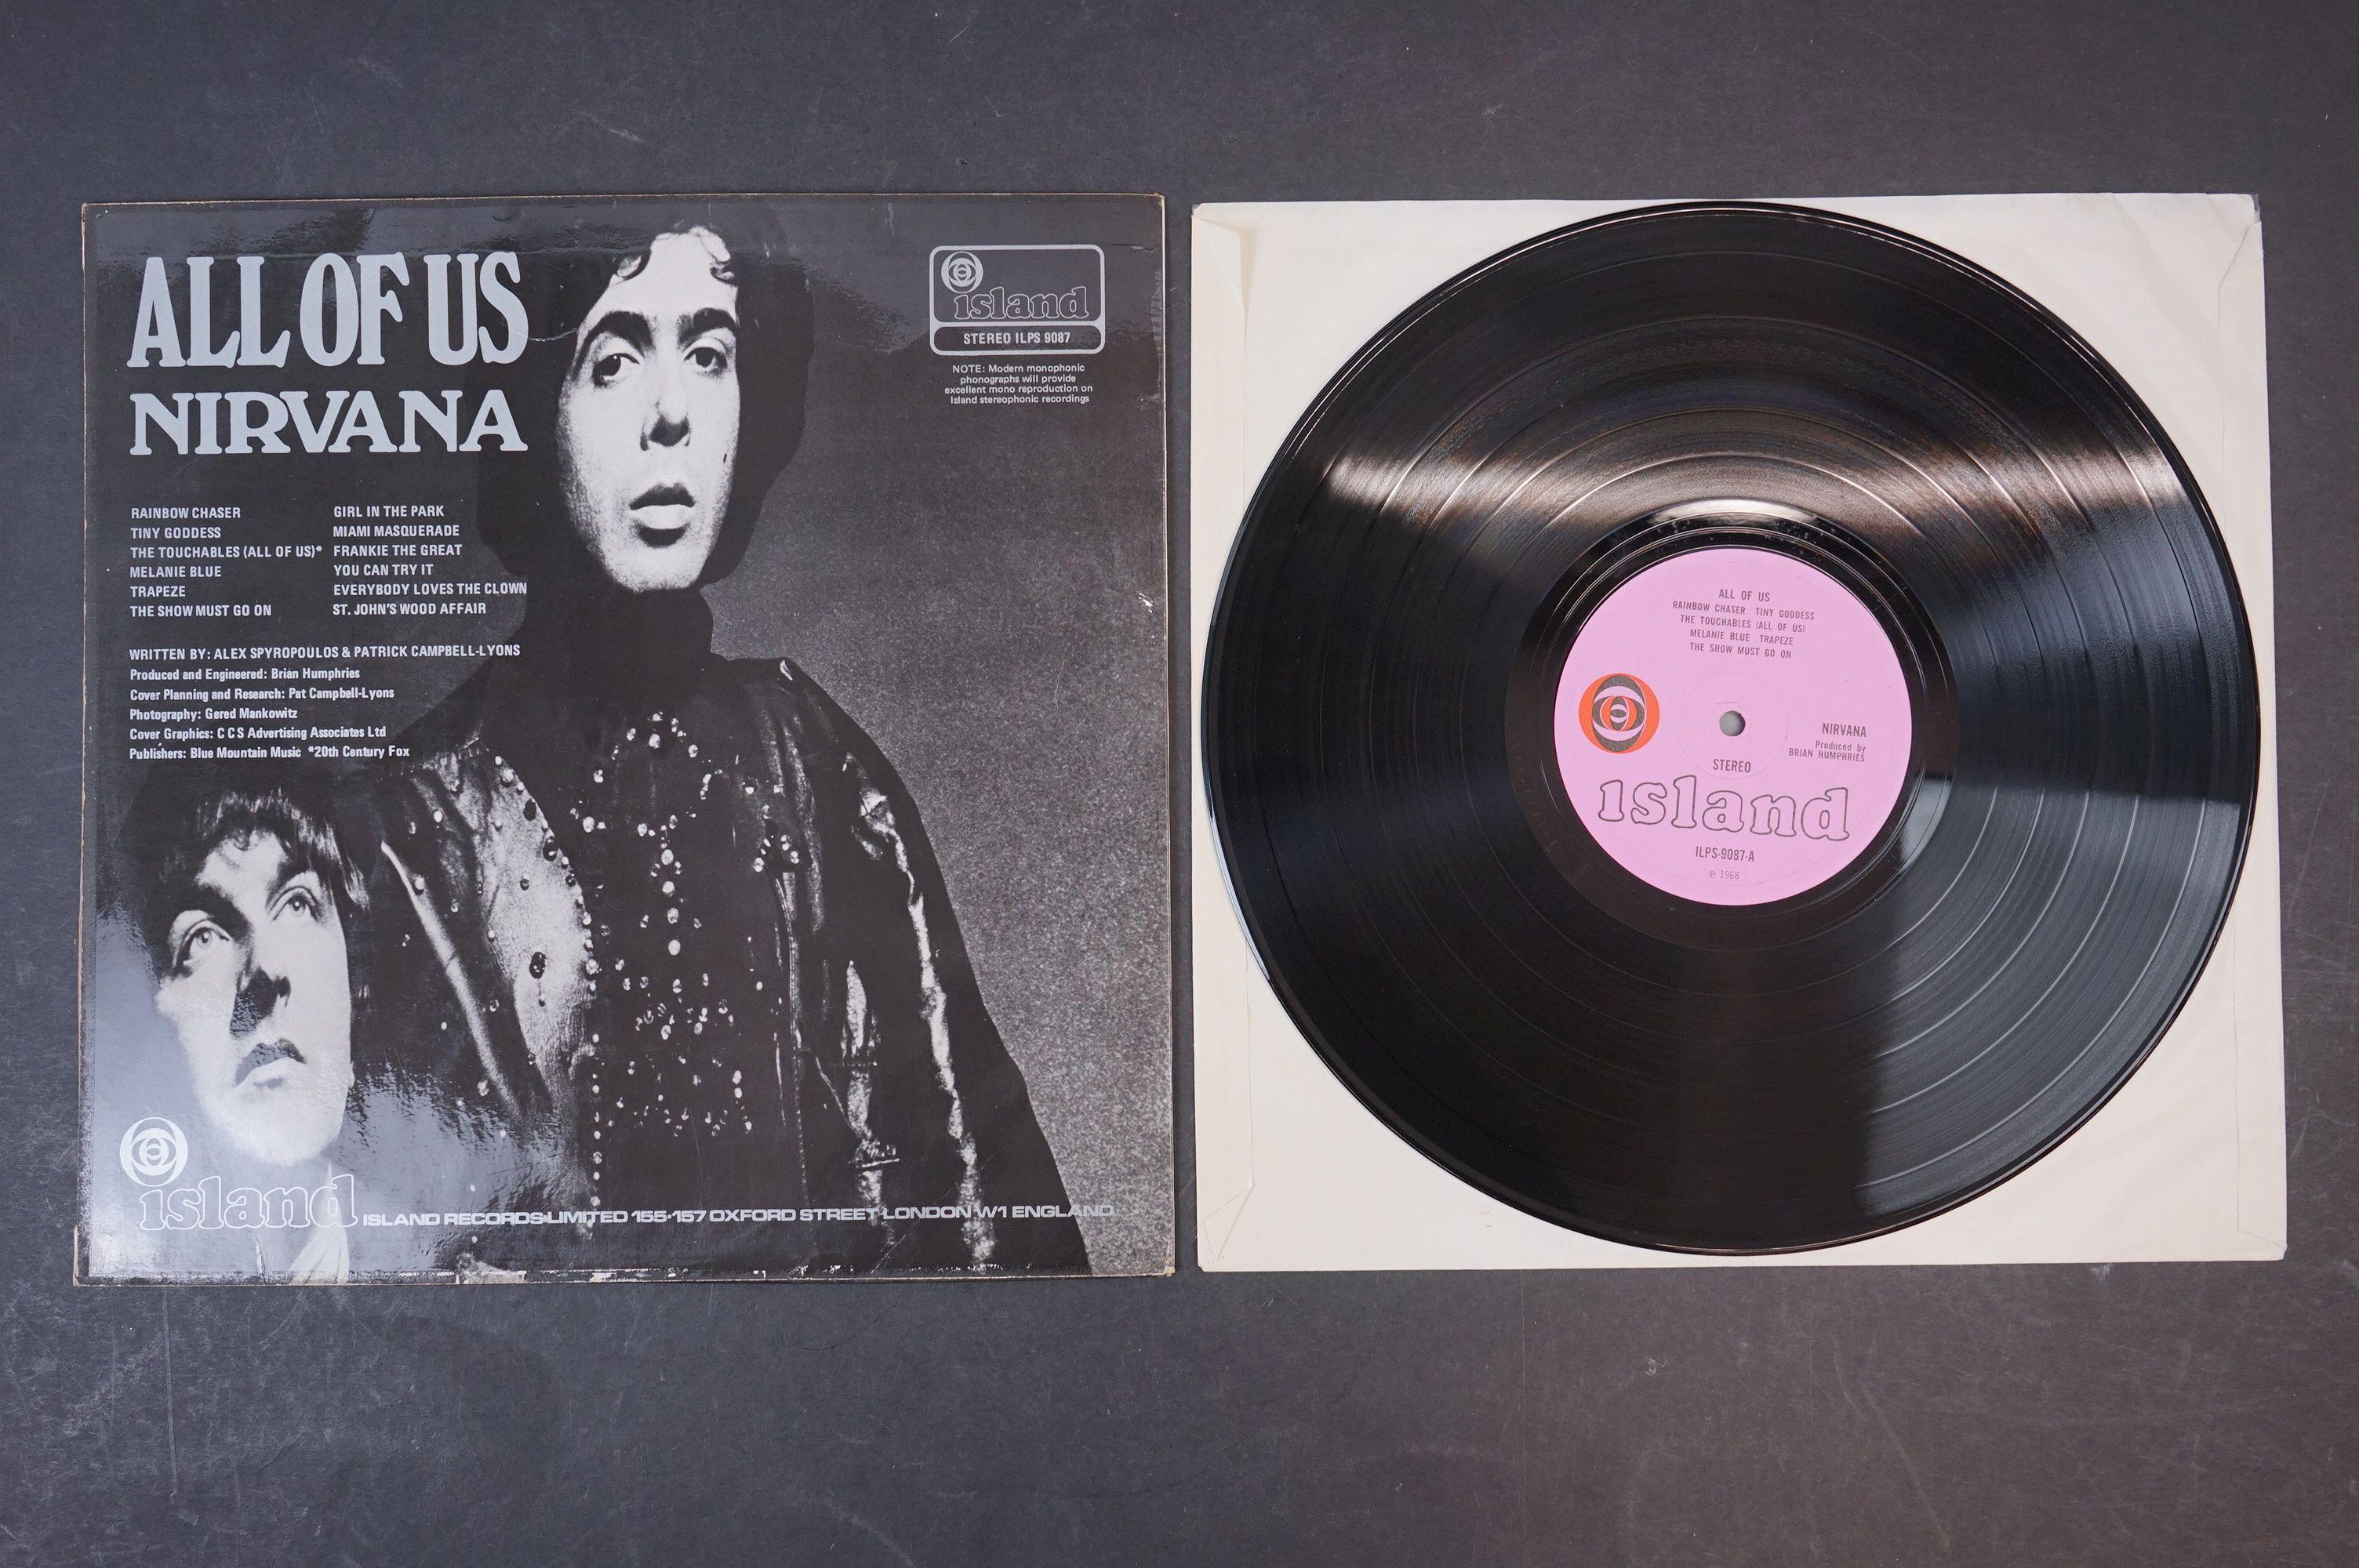 Vinyl - Nirvana All Of Us LP on Island ILPS 9087 with pink label, orange/black circle logo, - Image 3 of 6